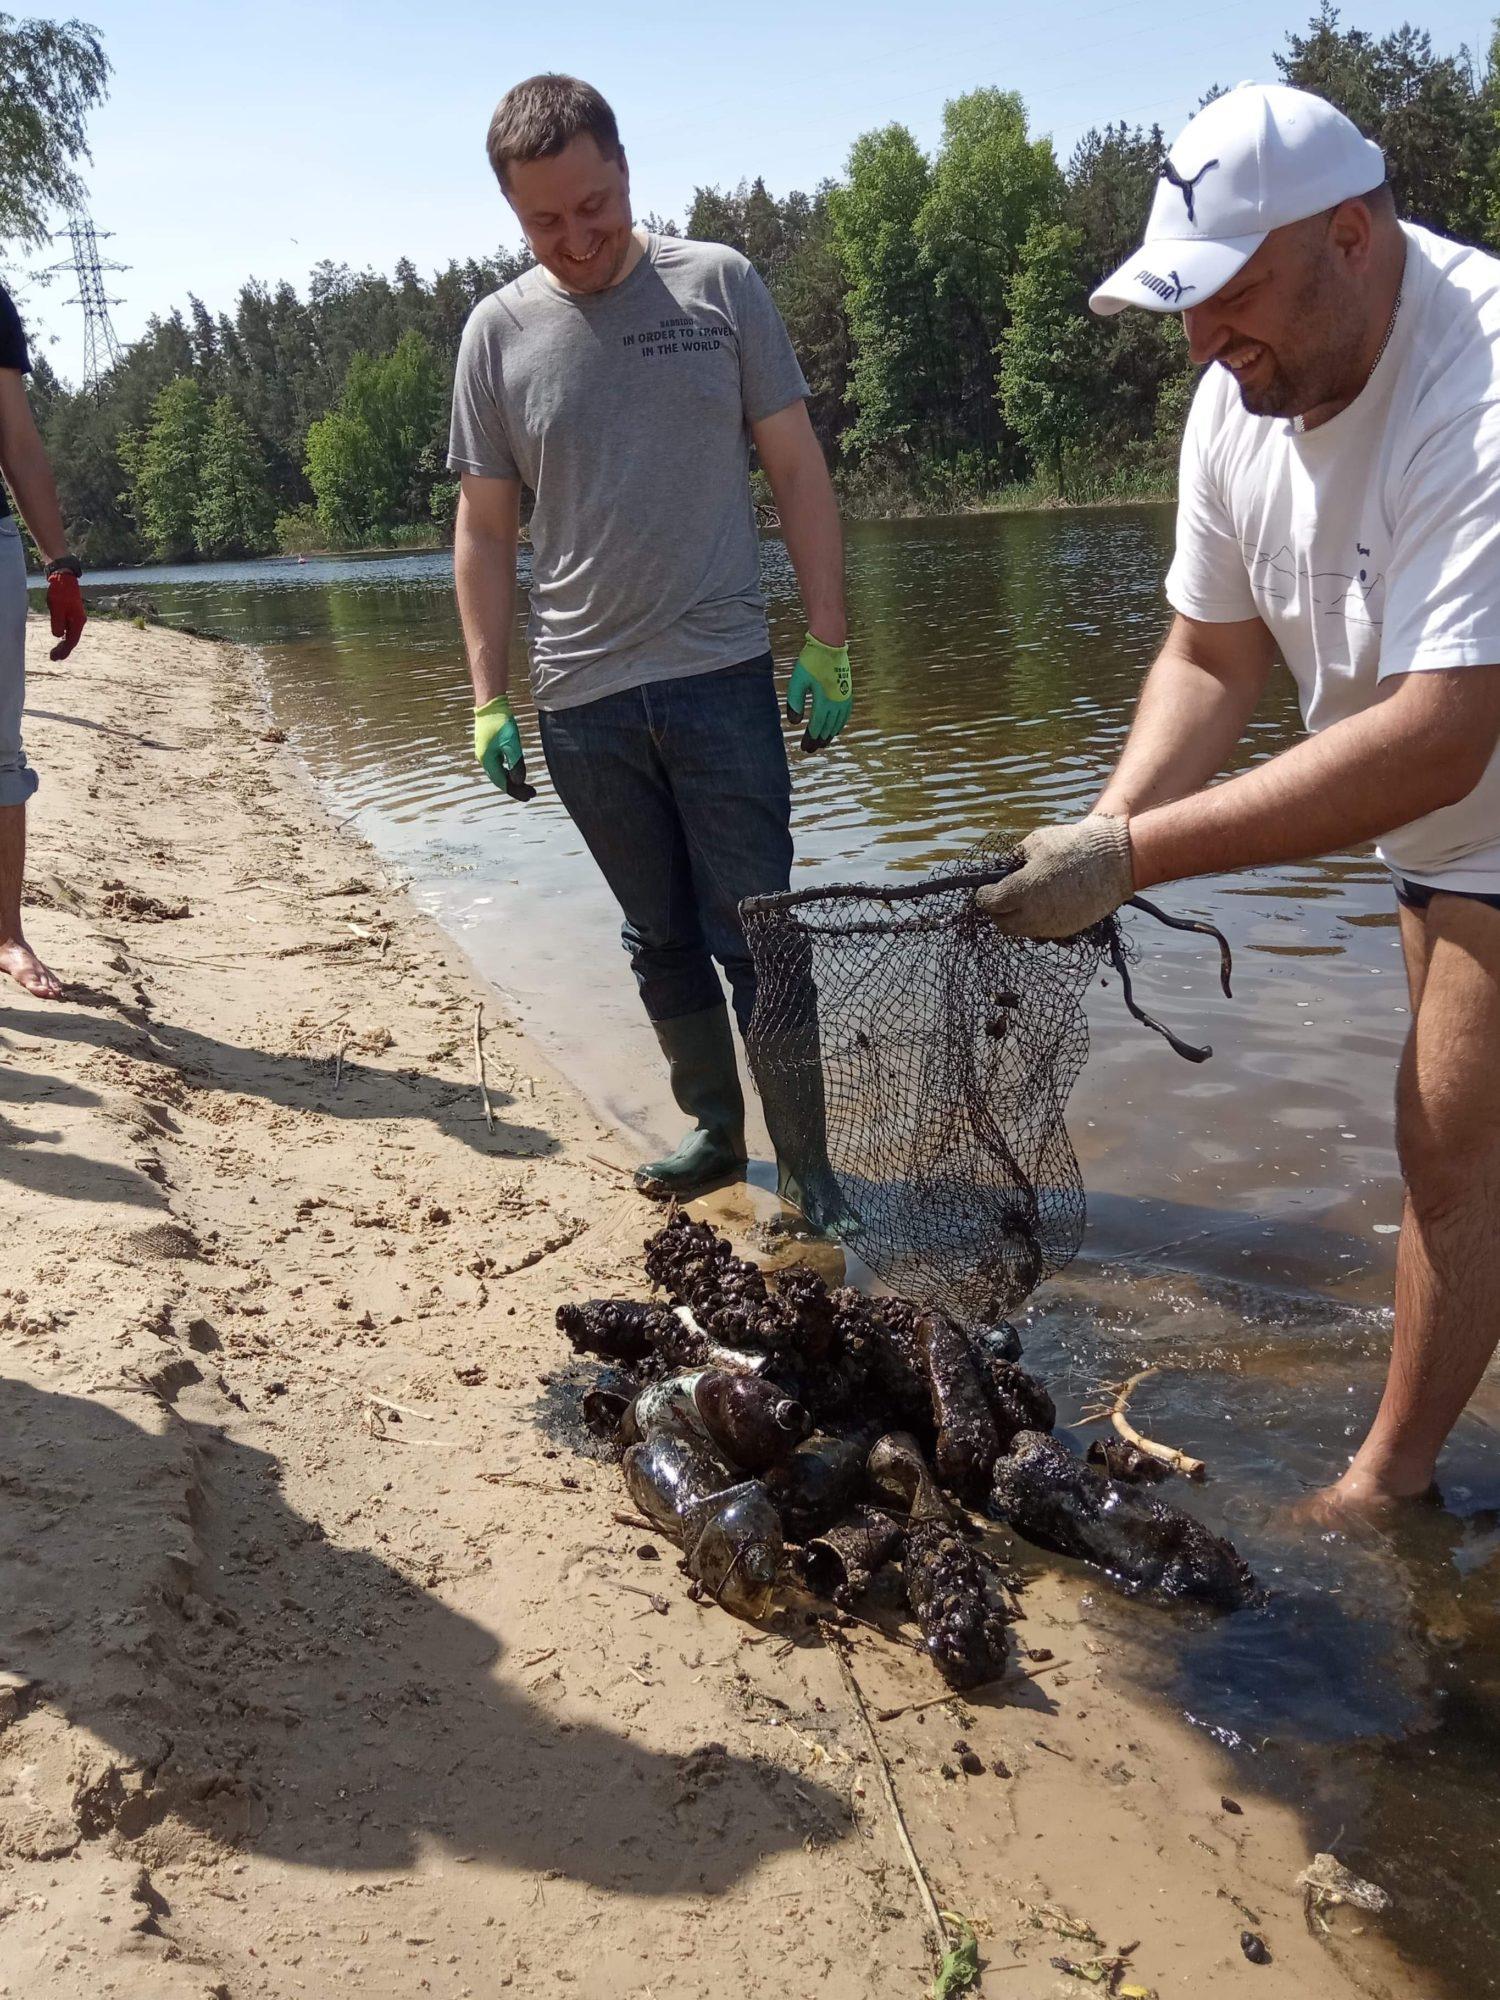 В Українці водолази обстежили дно річки Стугна -  - 3677F36B E7A1 40DD 8F4C 5007071883D0 1500x2000